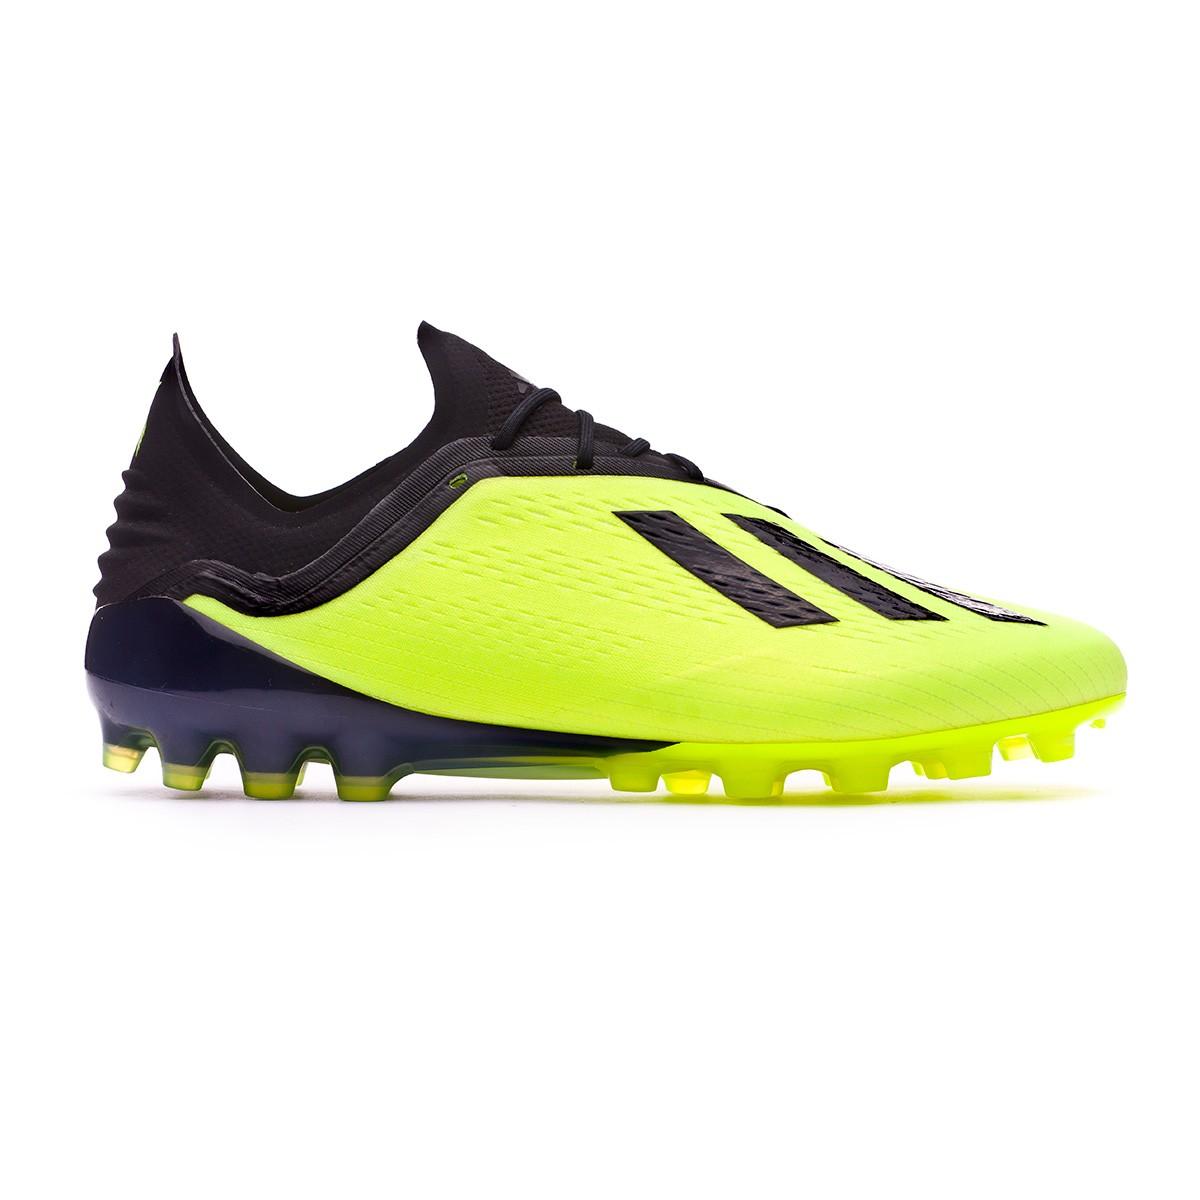 sports shoes 6ec07 351bf Football Boots adidas X 18.1 AG Solar yellow-Core black-White - Football  store Fútbol Emotion